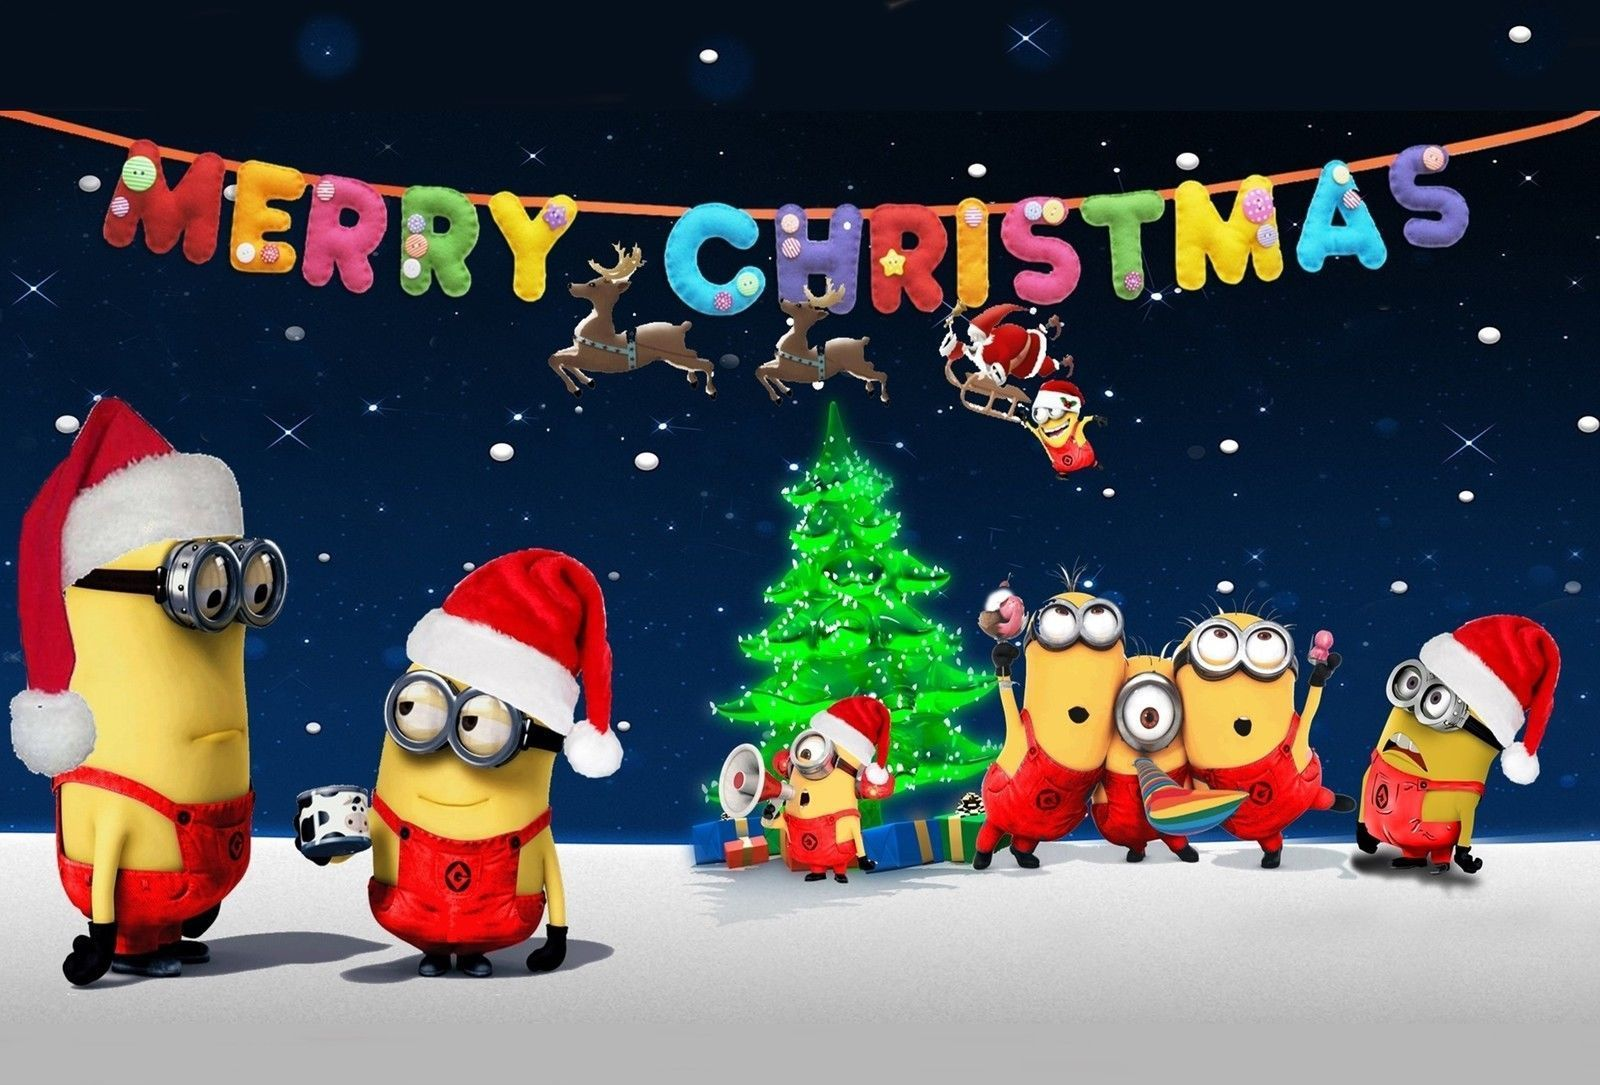 Minions Christmas Desktop Tablet Wallpaper Minion Christmas